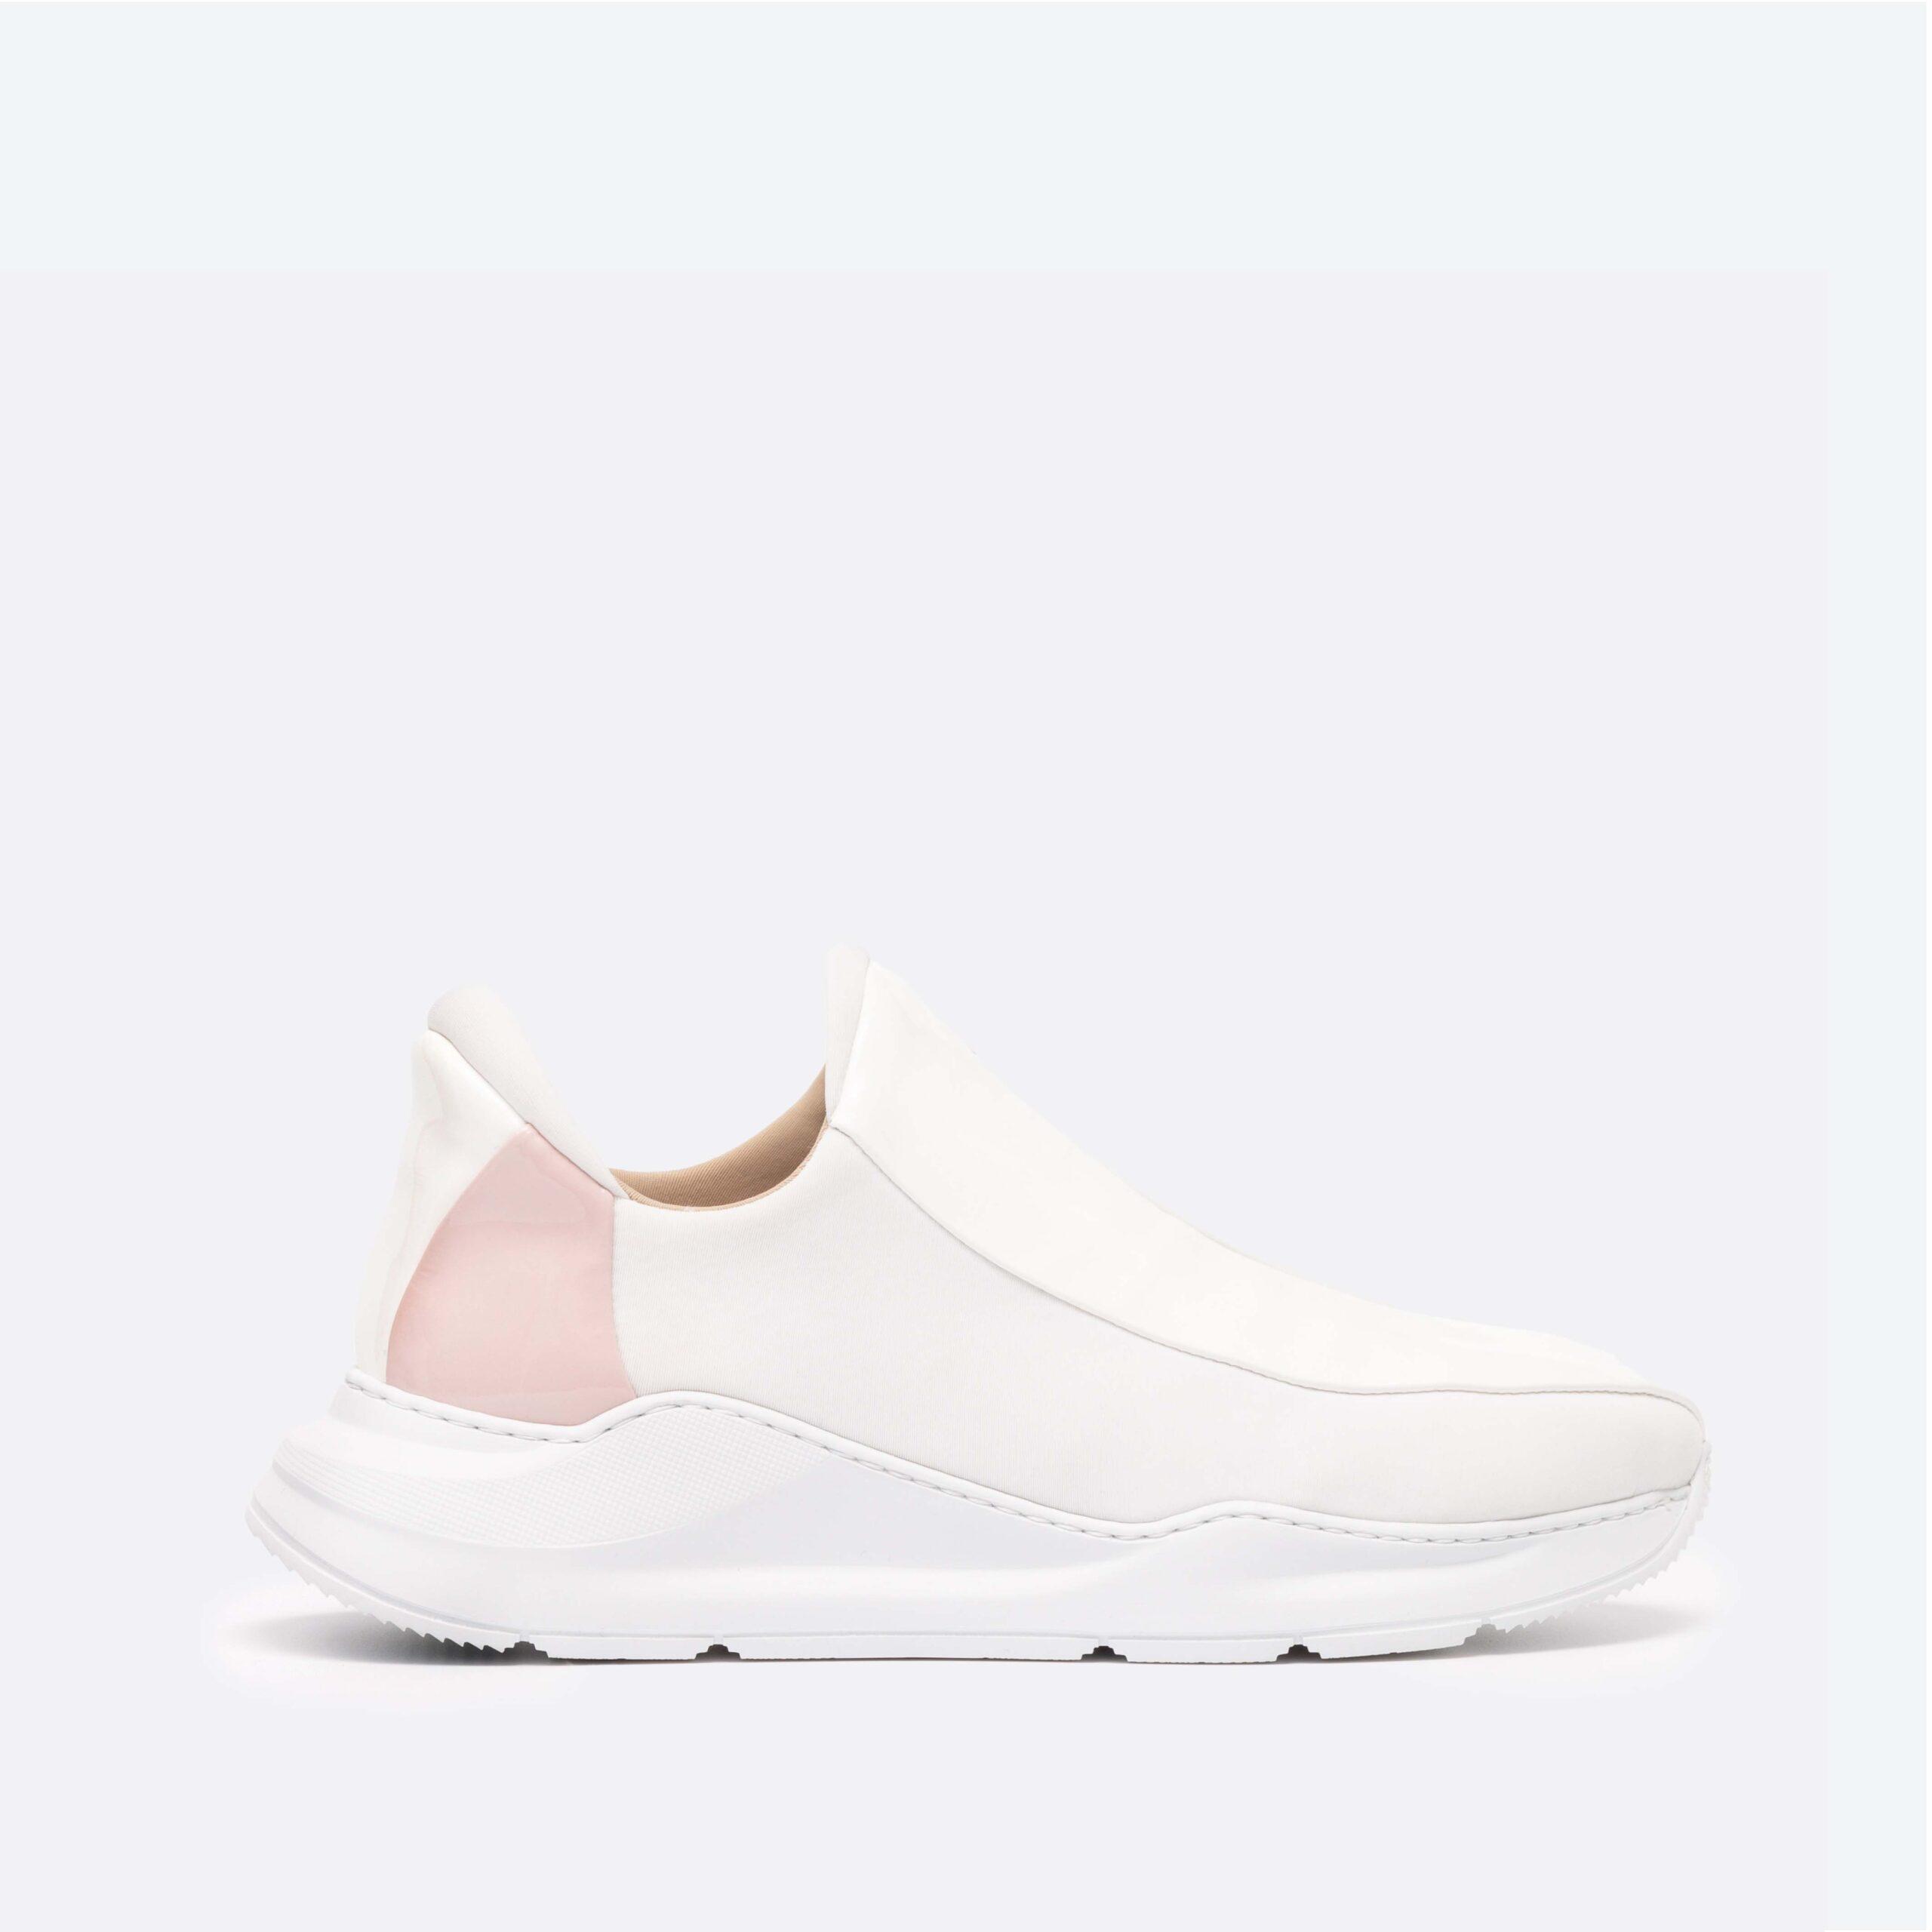 Electron. 05 Sneaker Blanche et Rose